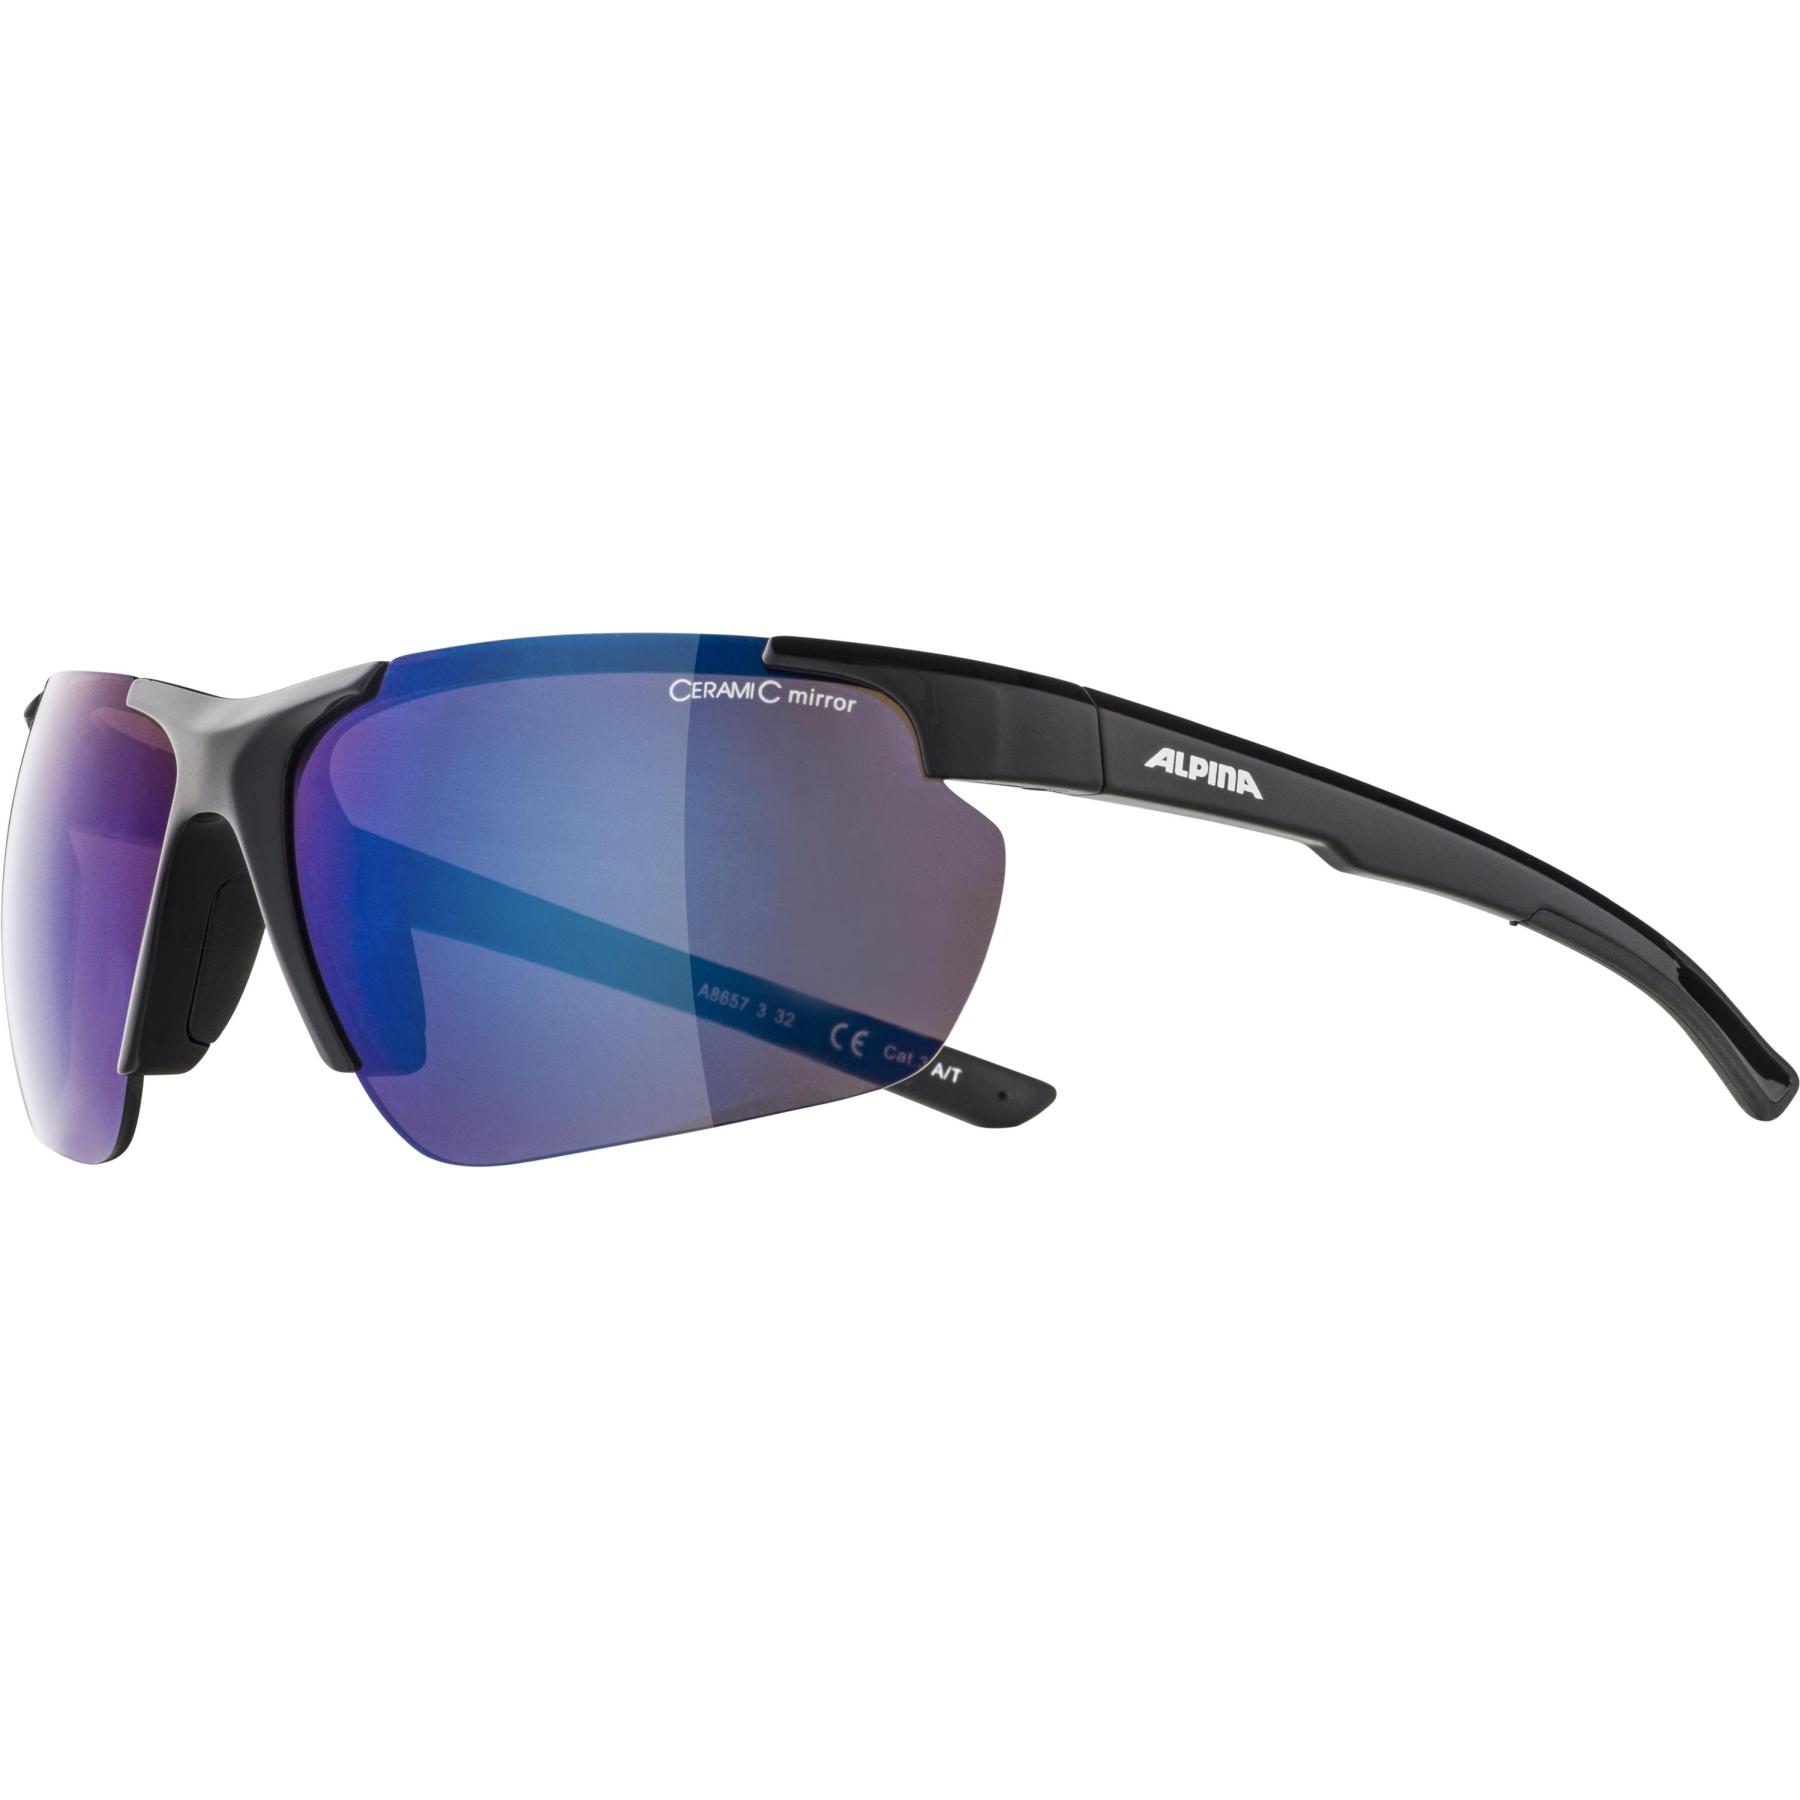 Image of Alpina Defey HR Glasses - black  / blue mirror